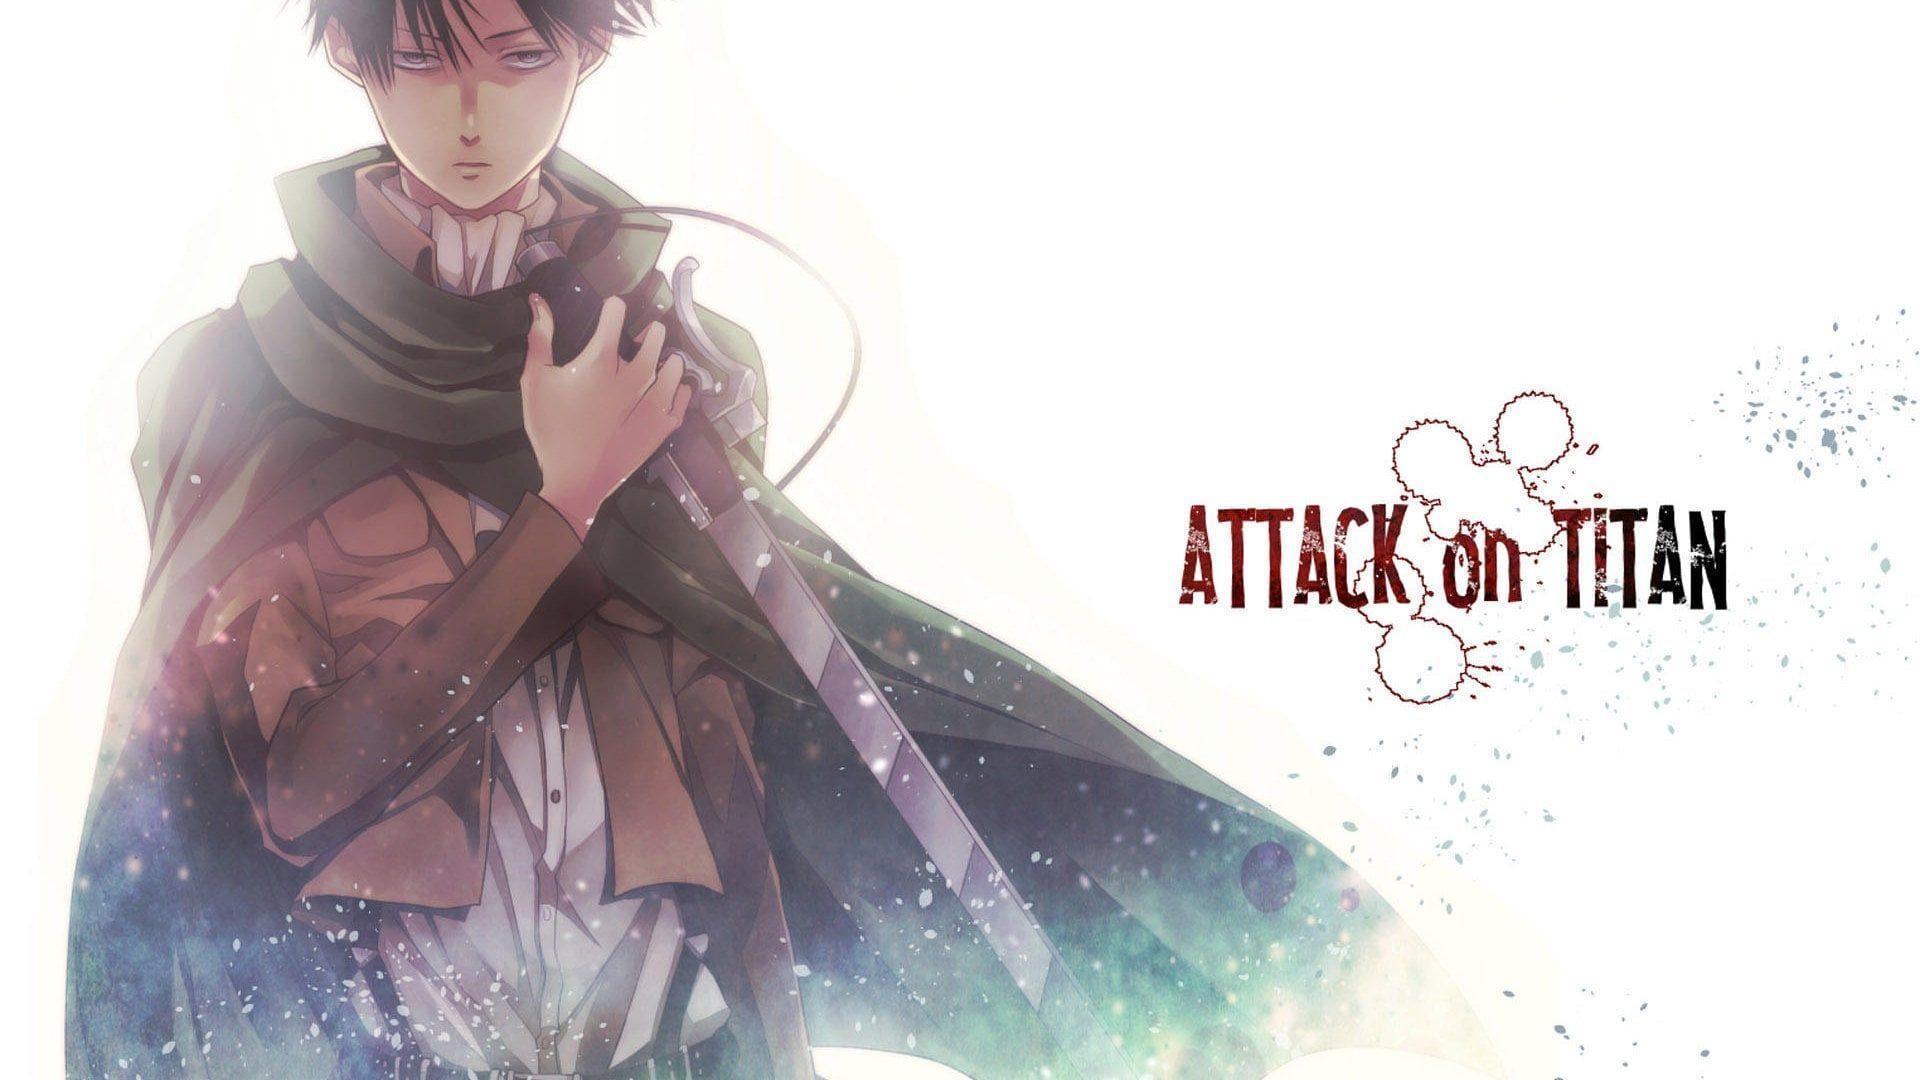 1920x1080 Attack On Titan Hình nền.  Attack On Titan Wallpaper Anime, Attack On Titan Wallpaper và Attack On Titan Chibi Wallpaper